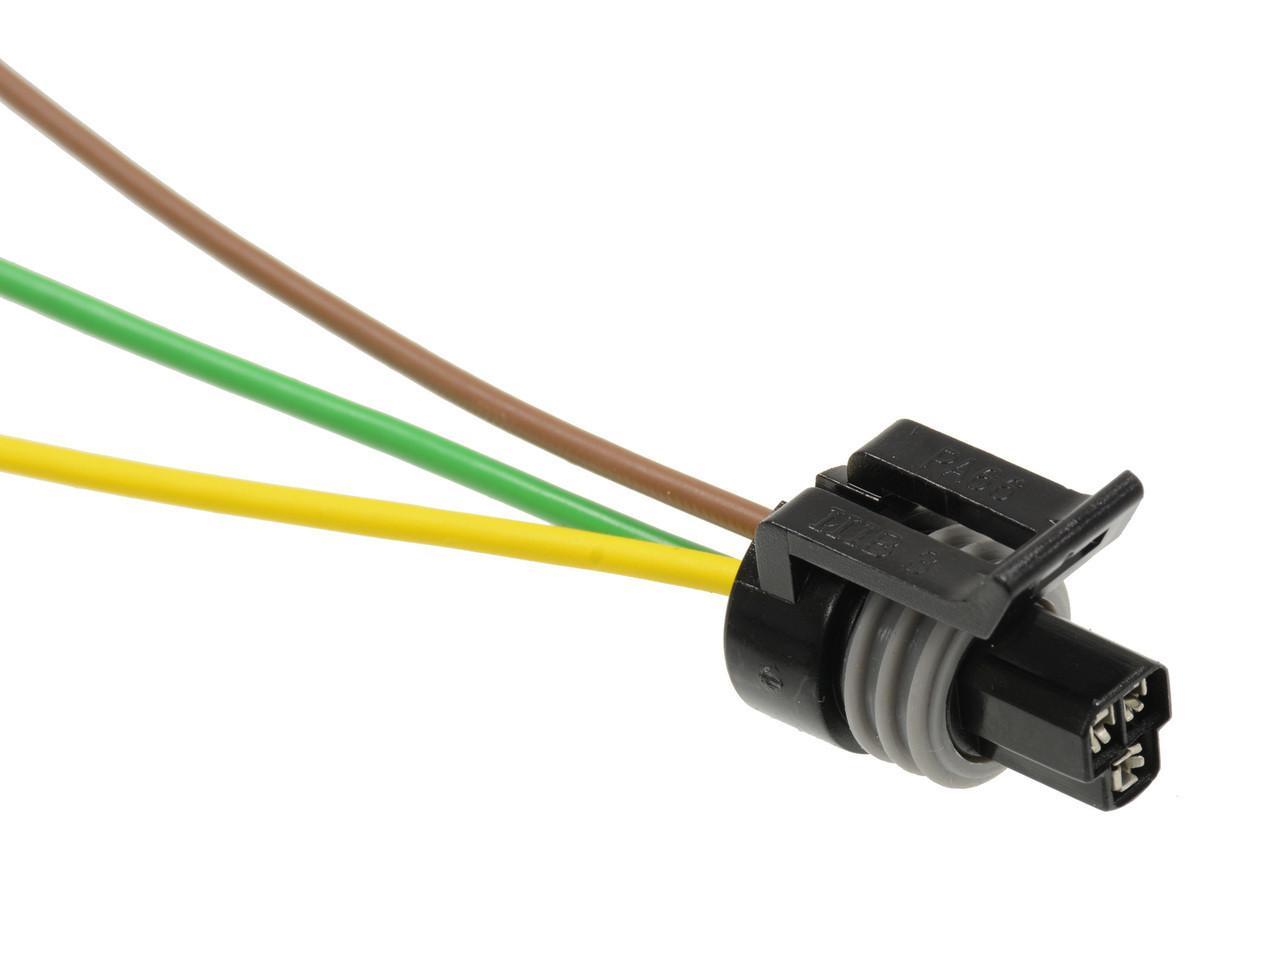 medium resolution of ls1 coolant temperature temp sensor connector harness 3 wire fits gm gm coolant temp sensor wiring gm coolant temp sensor wiring